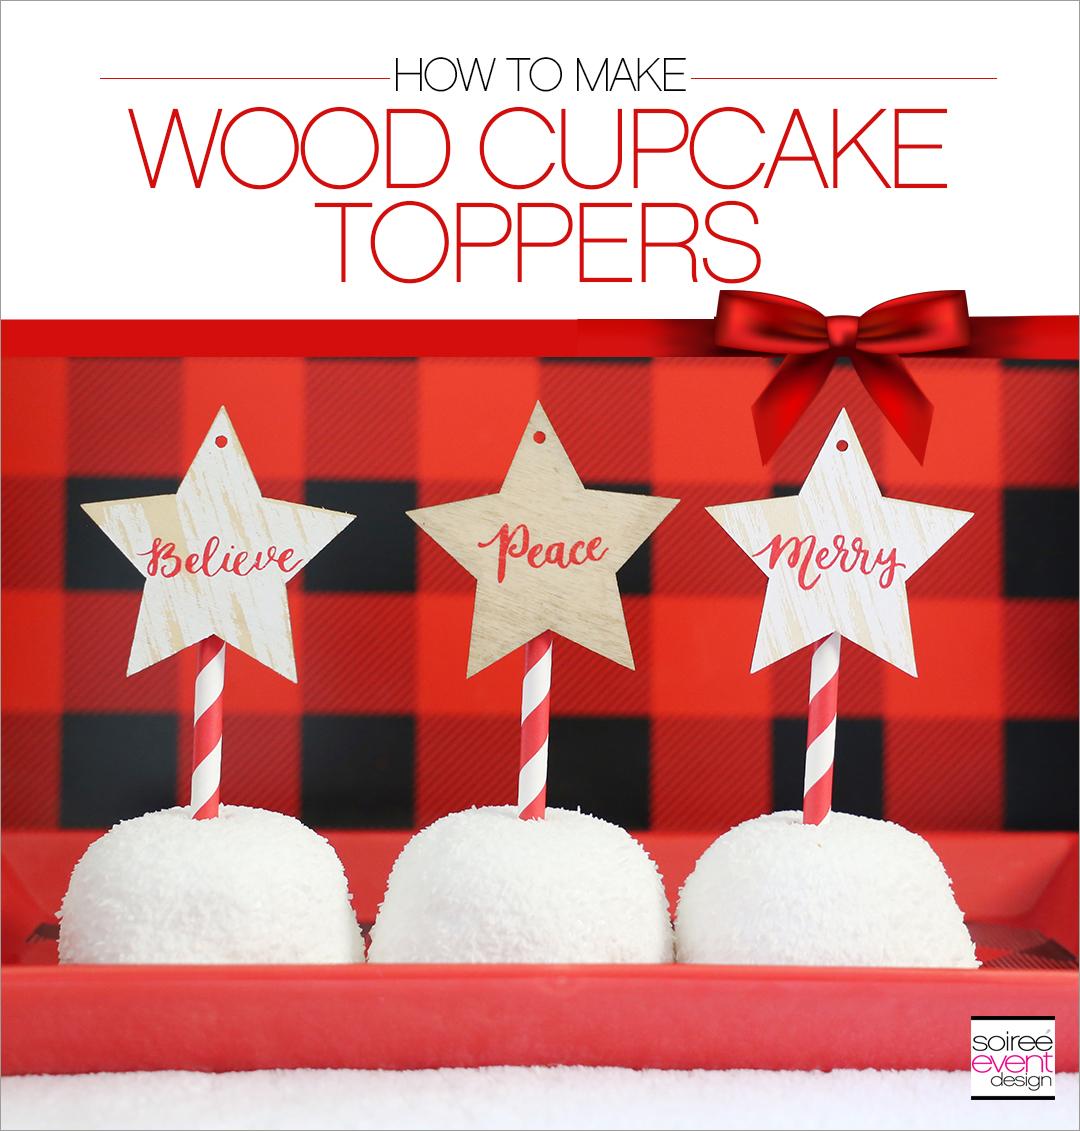 DIY Wood Cupcake Toppers